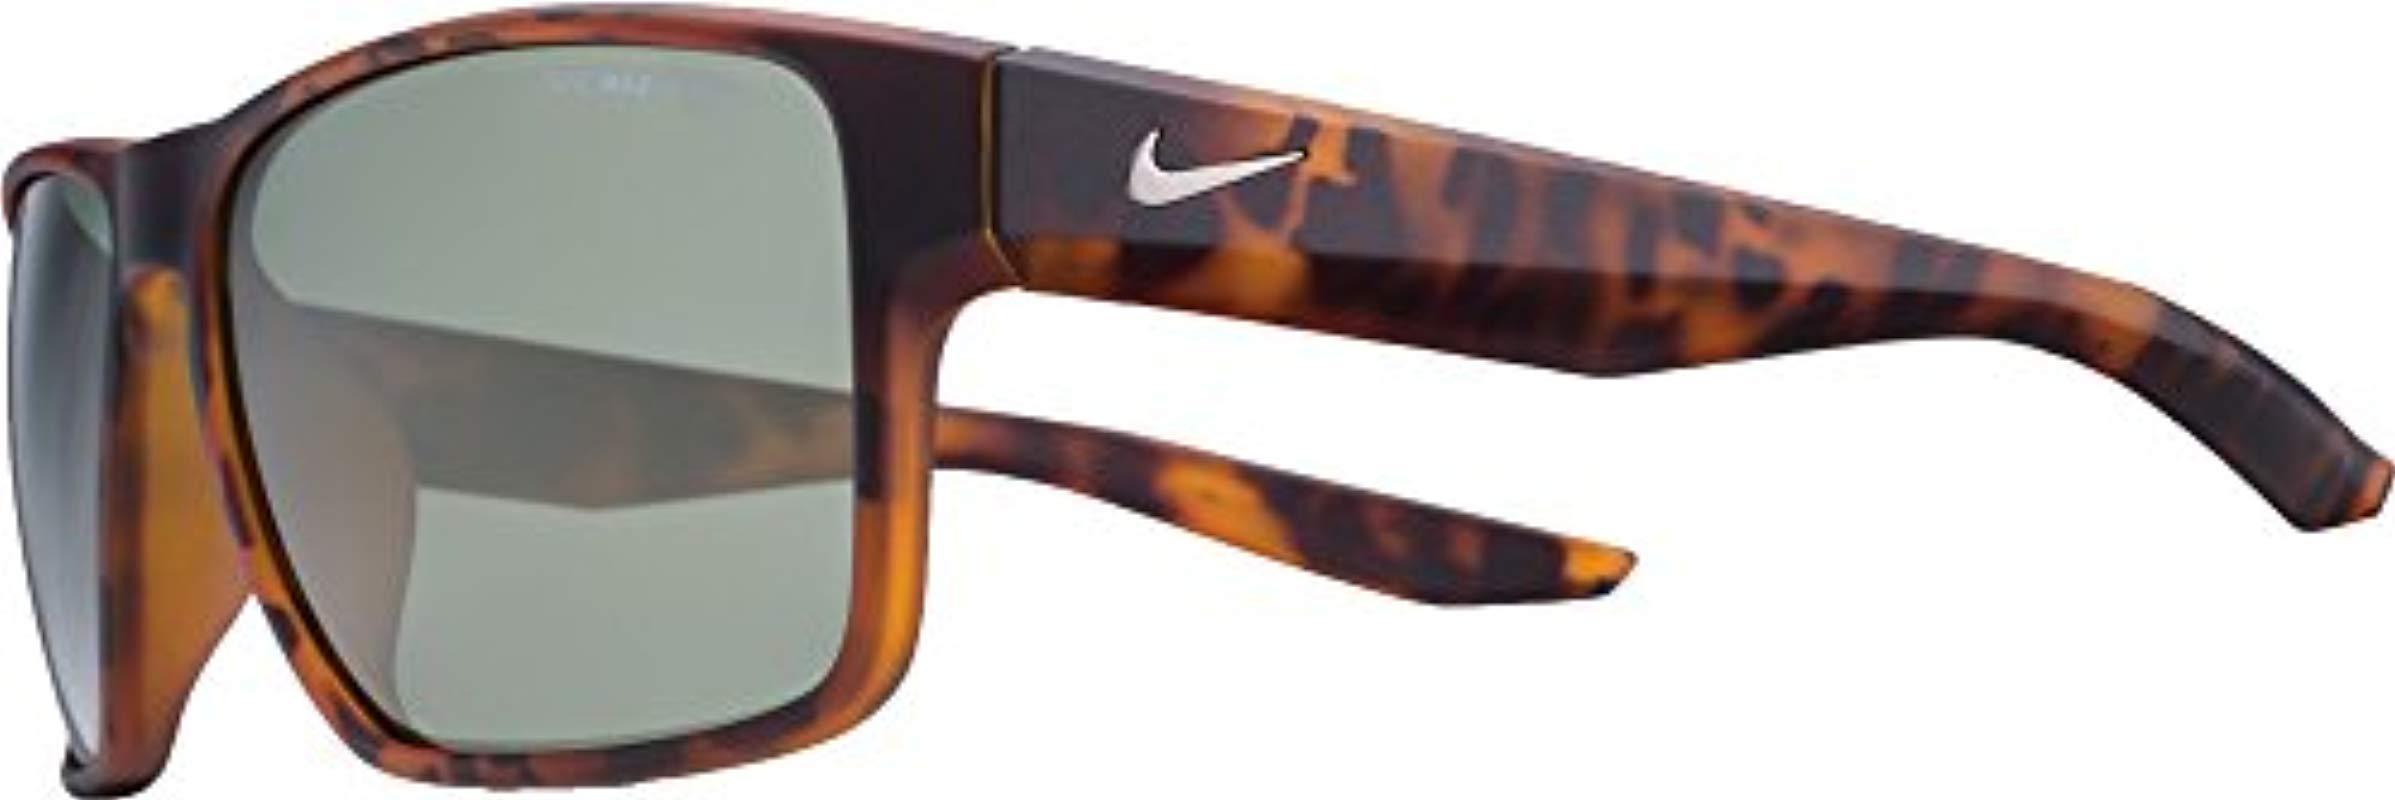 39f3f3f86c93 Lyst - Nike Essential Venture R Sunglasses - Ev1001 for Men